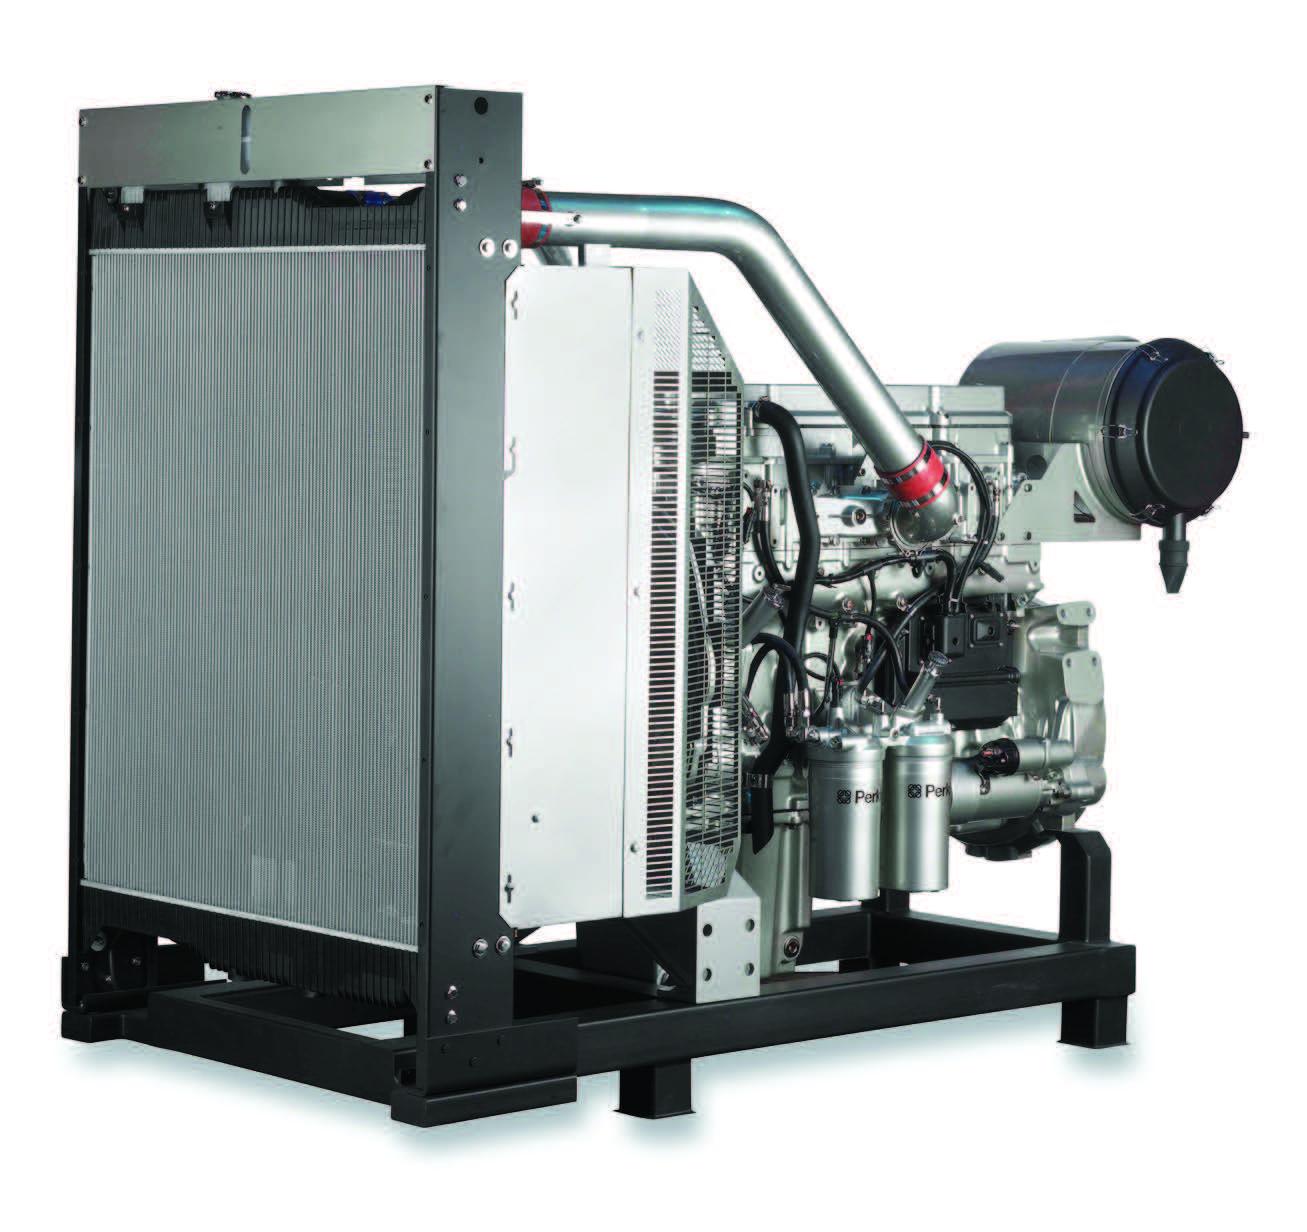 2206C-E13TAG3 Diesel Engine - ElectropaK